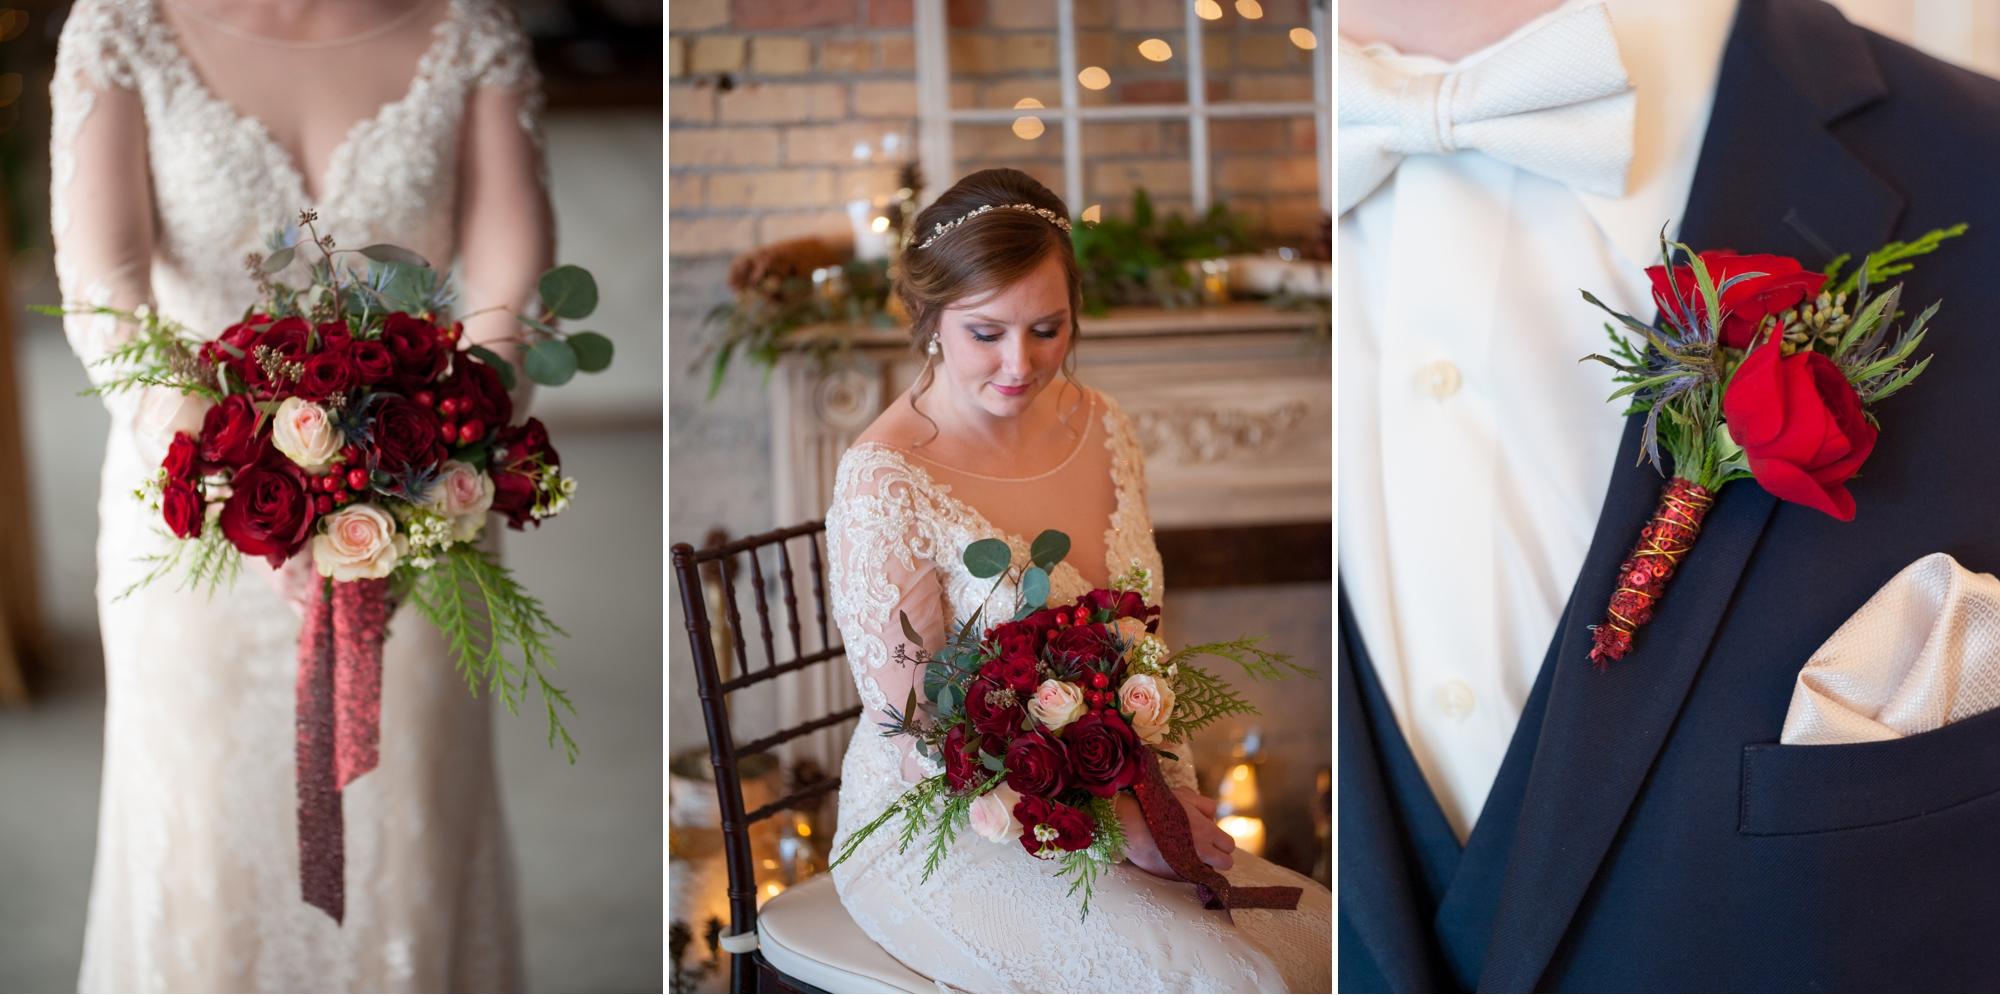 Best Green Bay Wedding Photography, Ginger Birch Floral.jpg